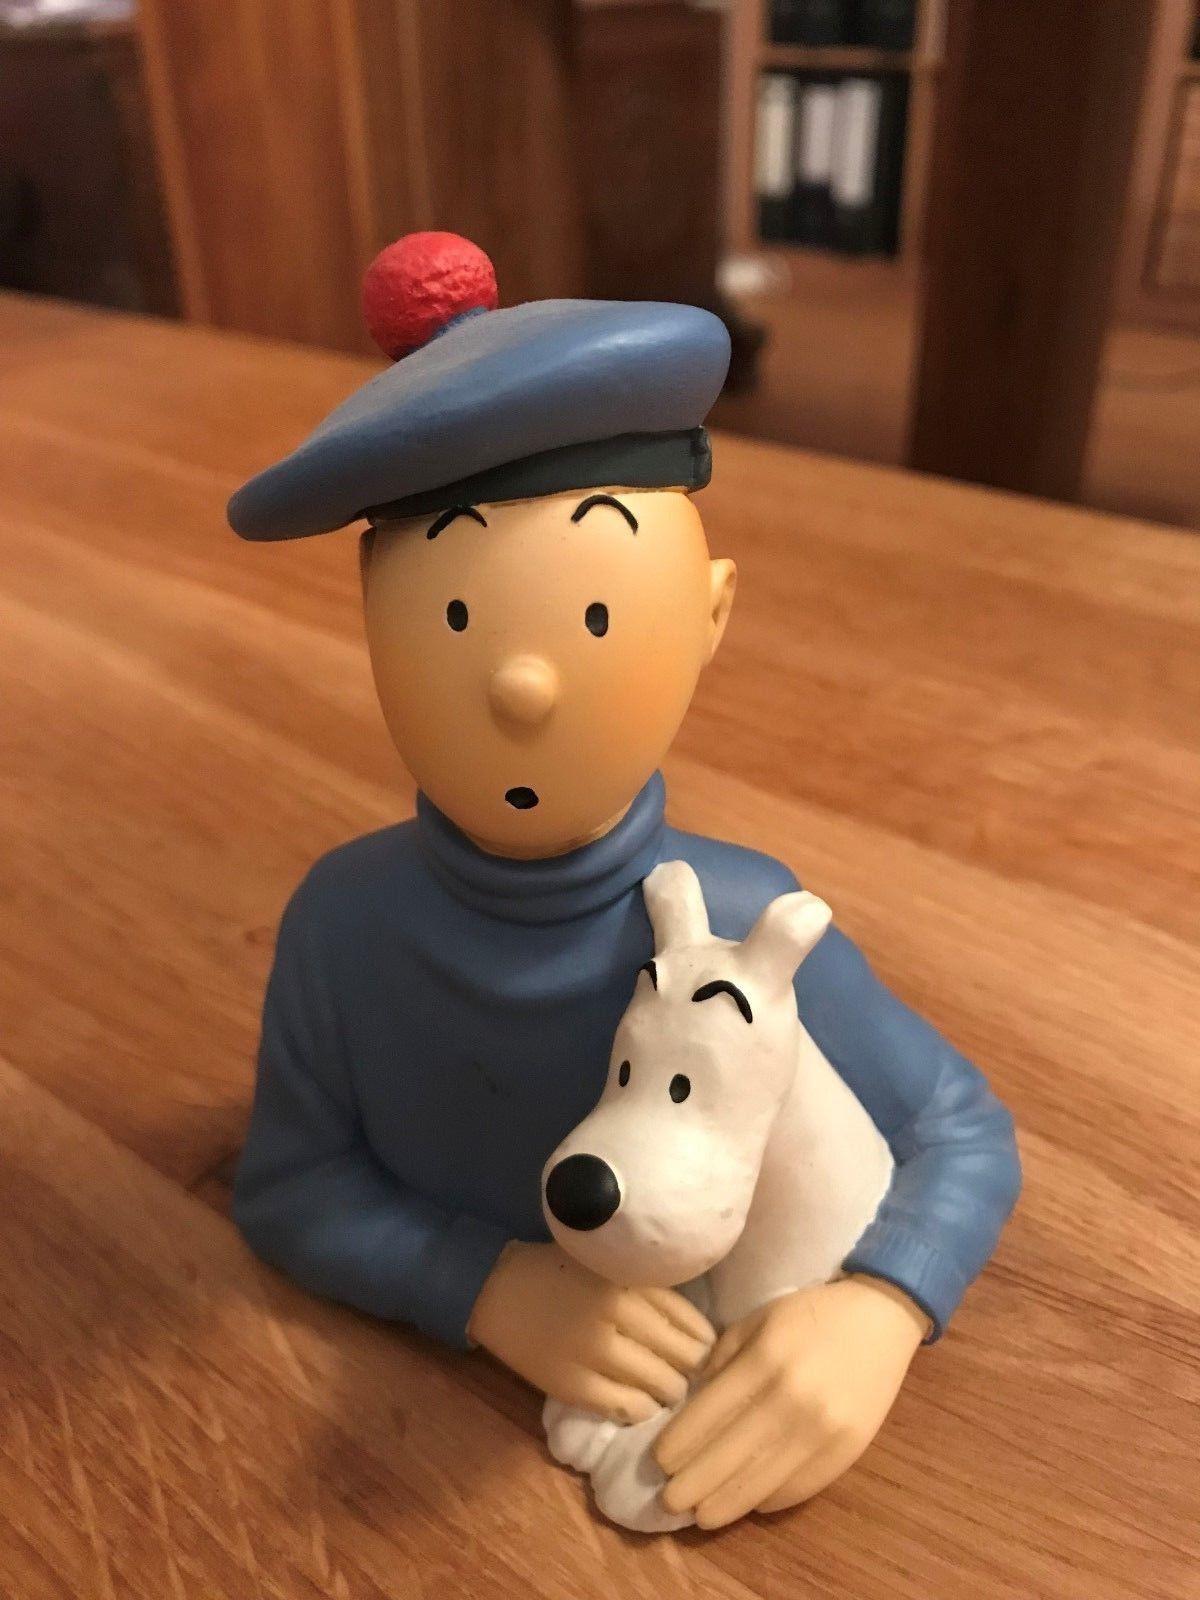 TINTIN Pixi - Petit Buste Tintin Ecossais, Ref 30010, selten, von 1993